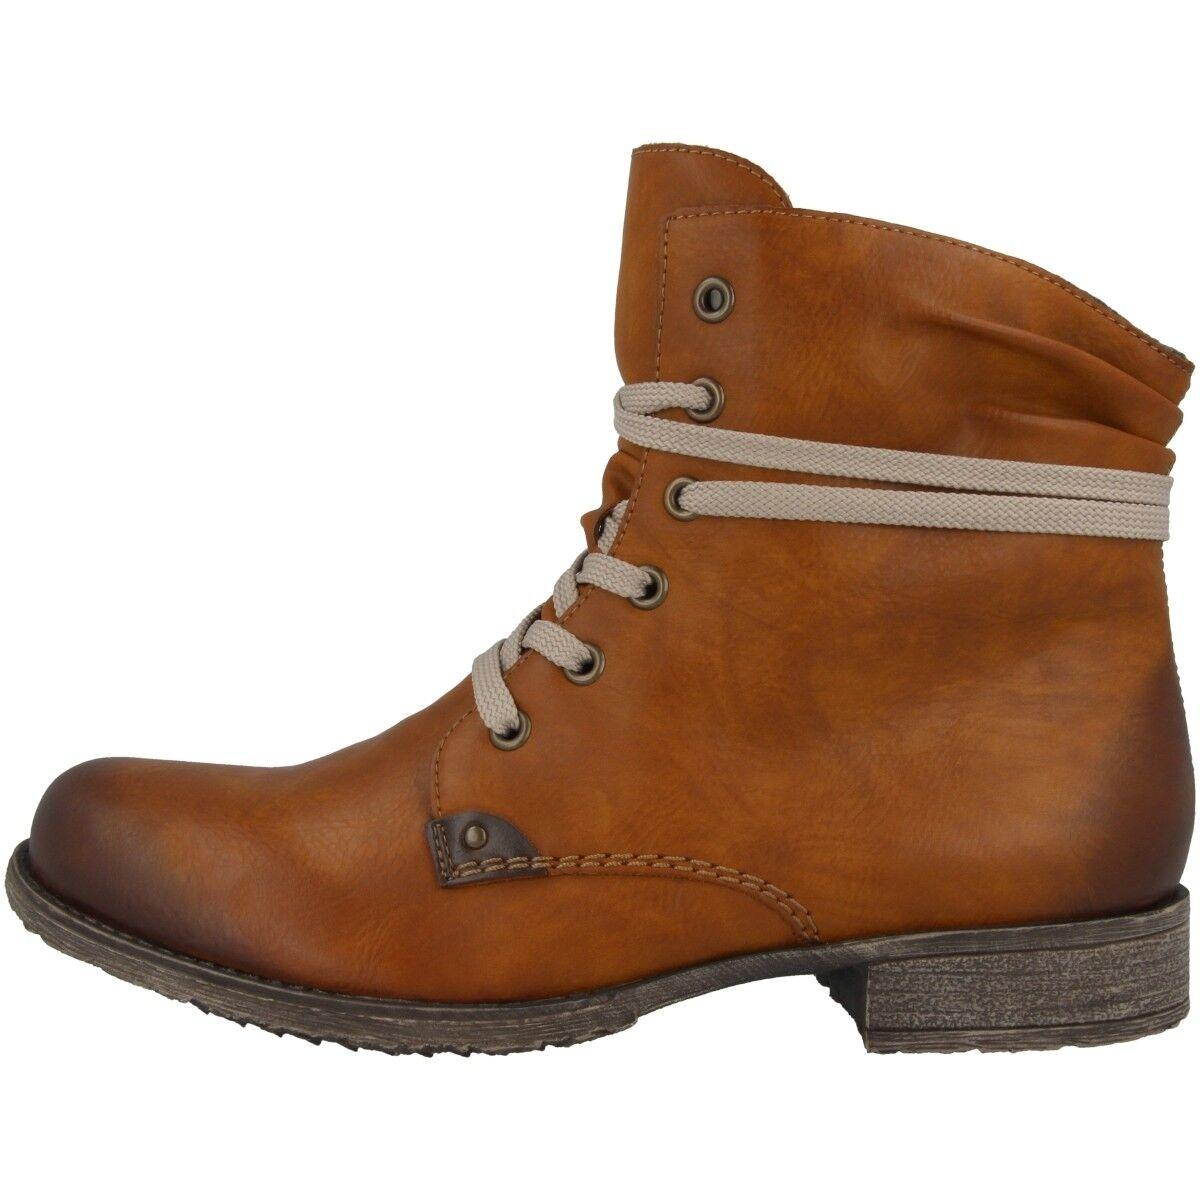 Rieker Eagle-Ambor Schuhe Antistress Stiefelette Schürschuhe Stiefel 70829-24